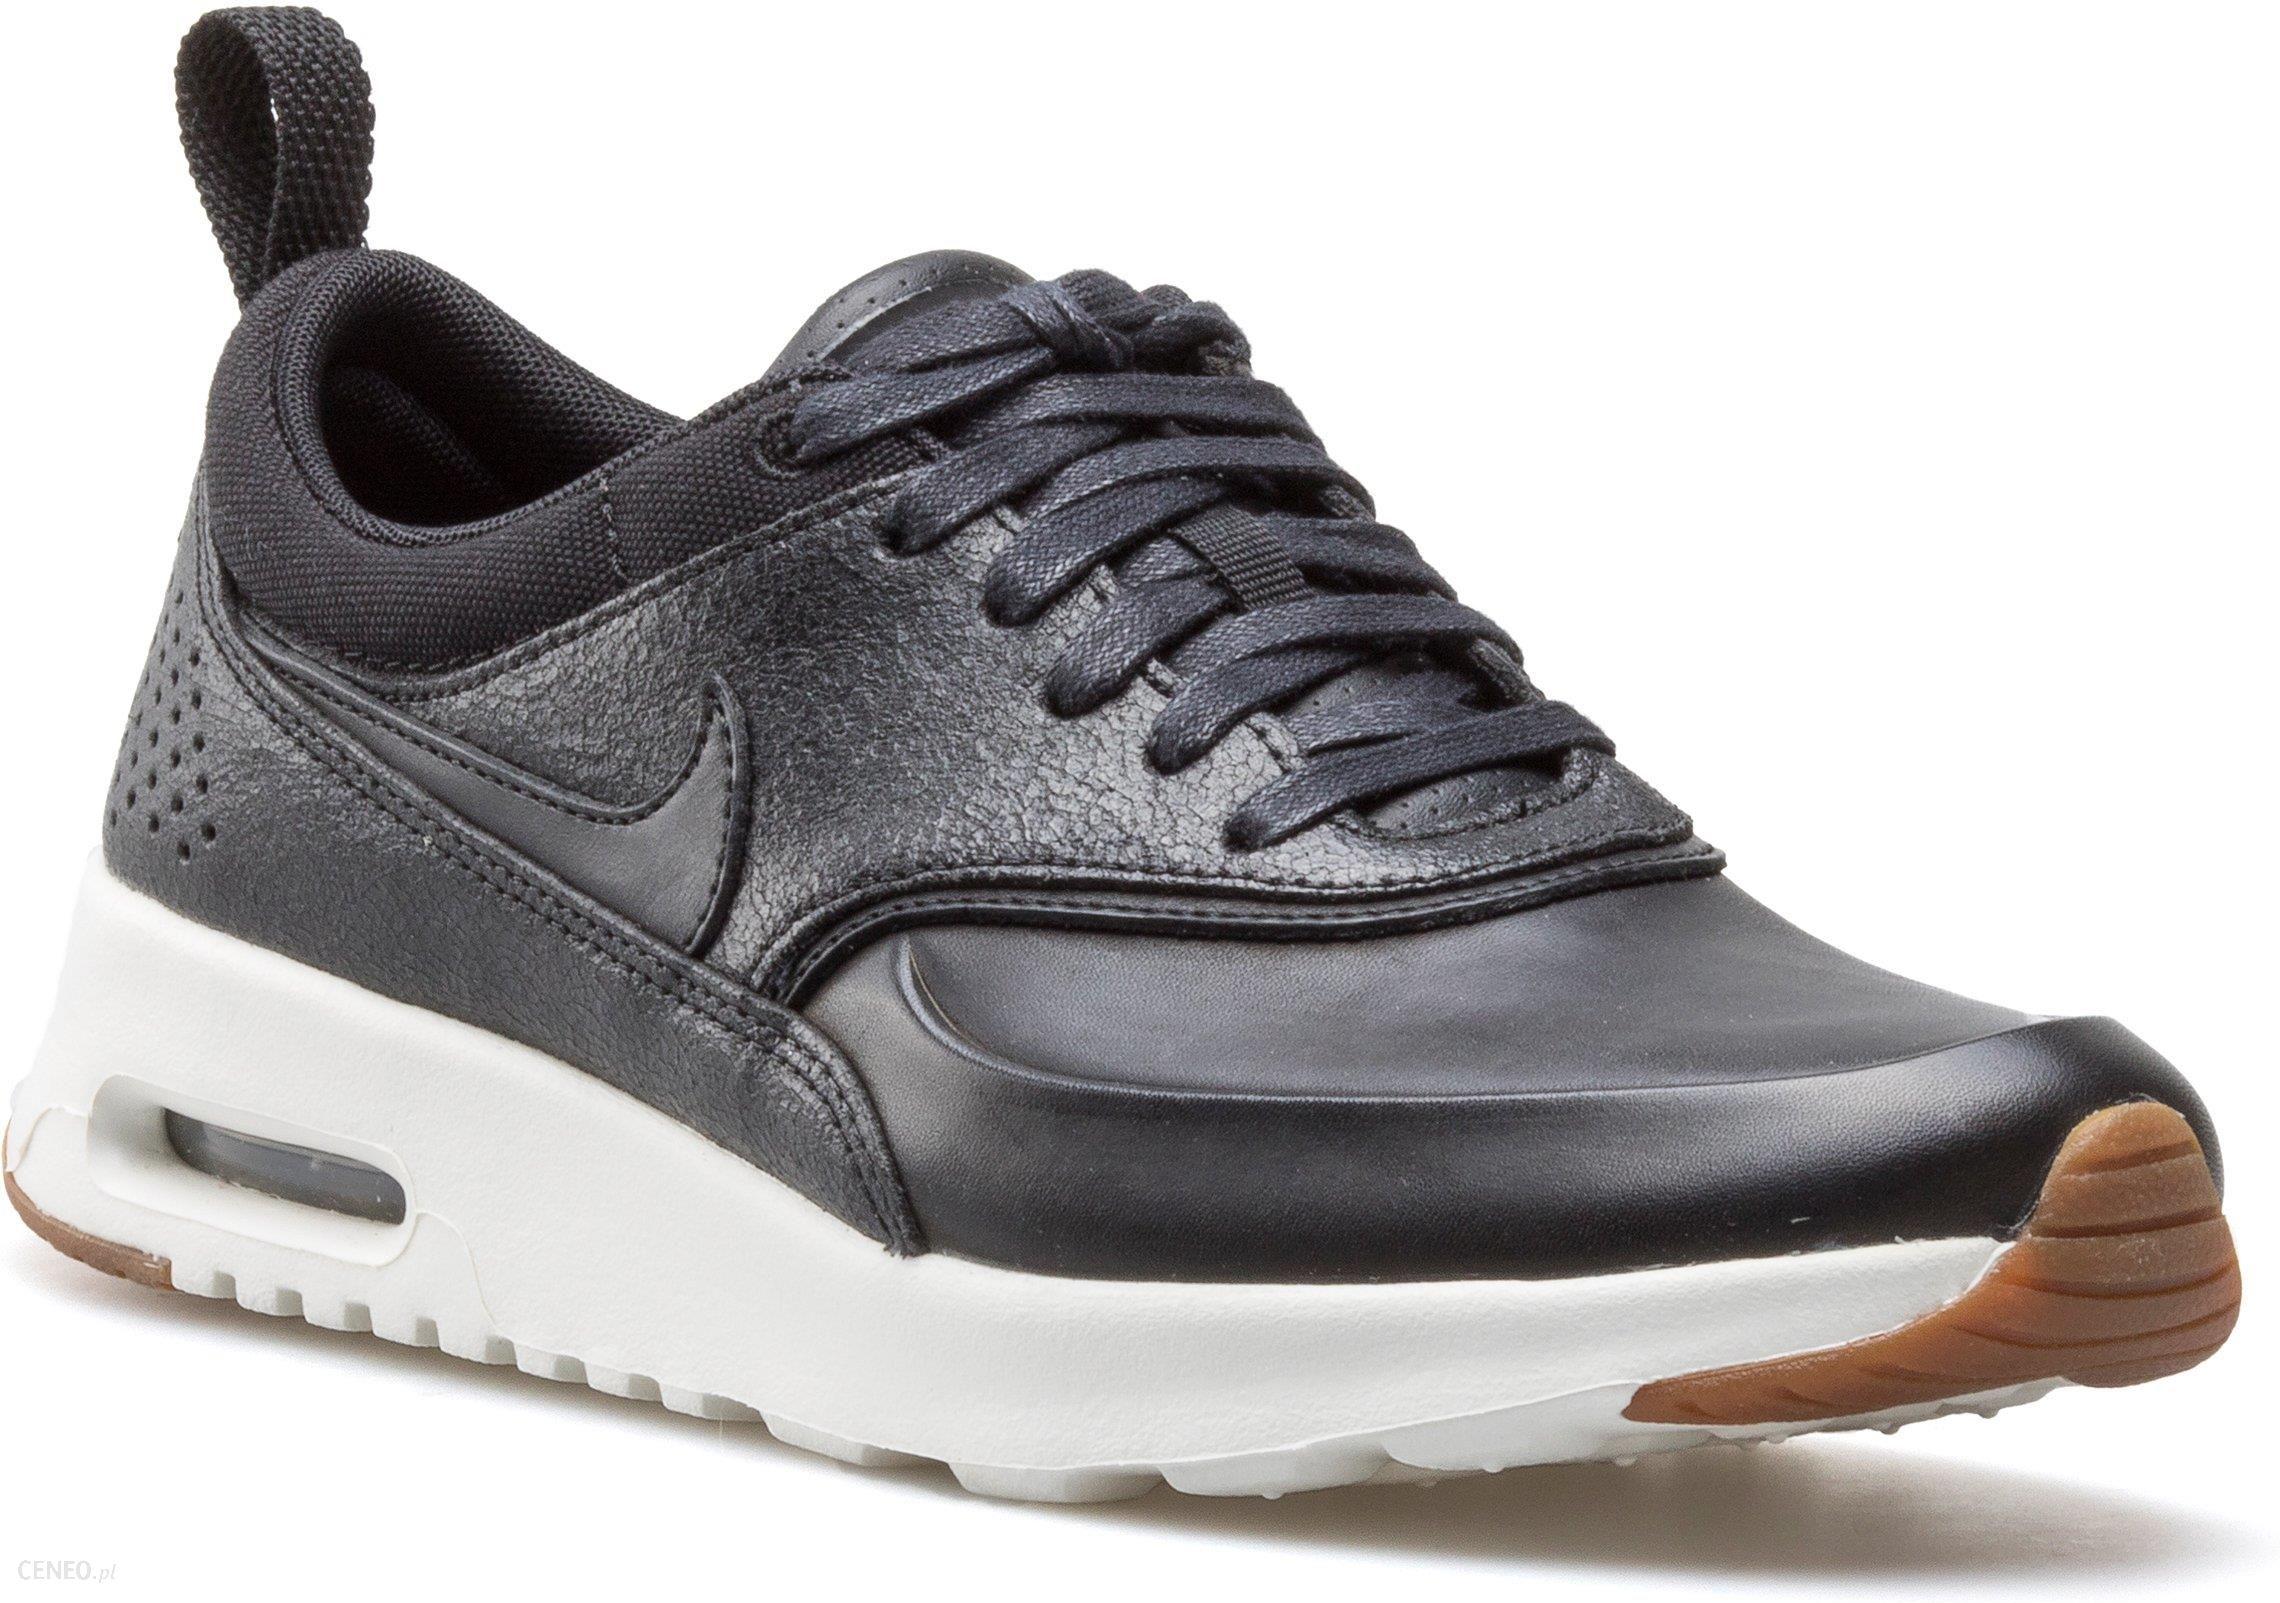 Buty damskie Nike Air Max Thea 616723 012 r. 39 Ceny i opinie Ceneo.pl